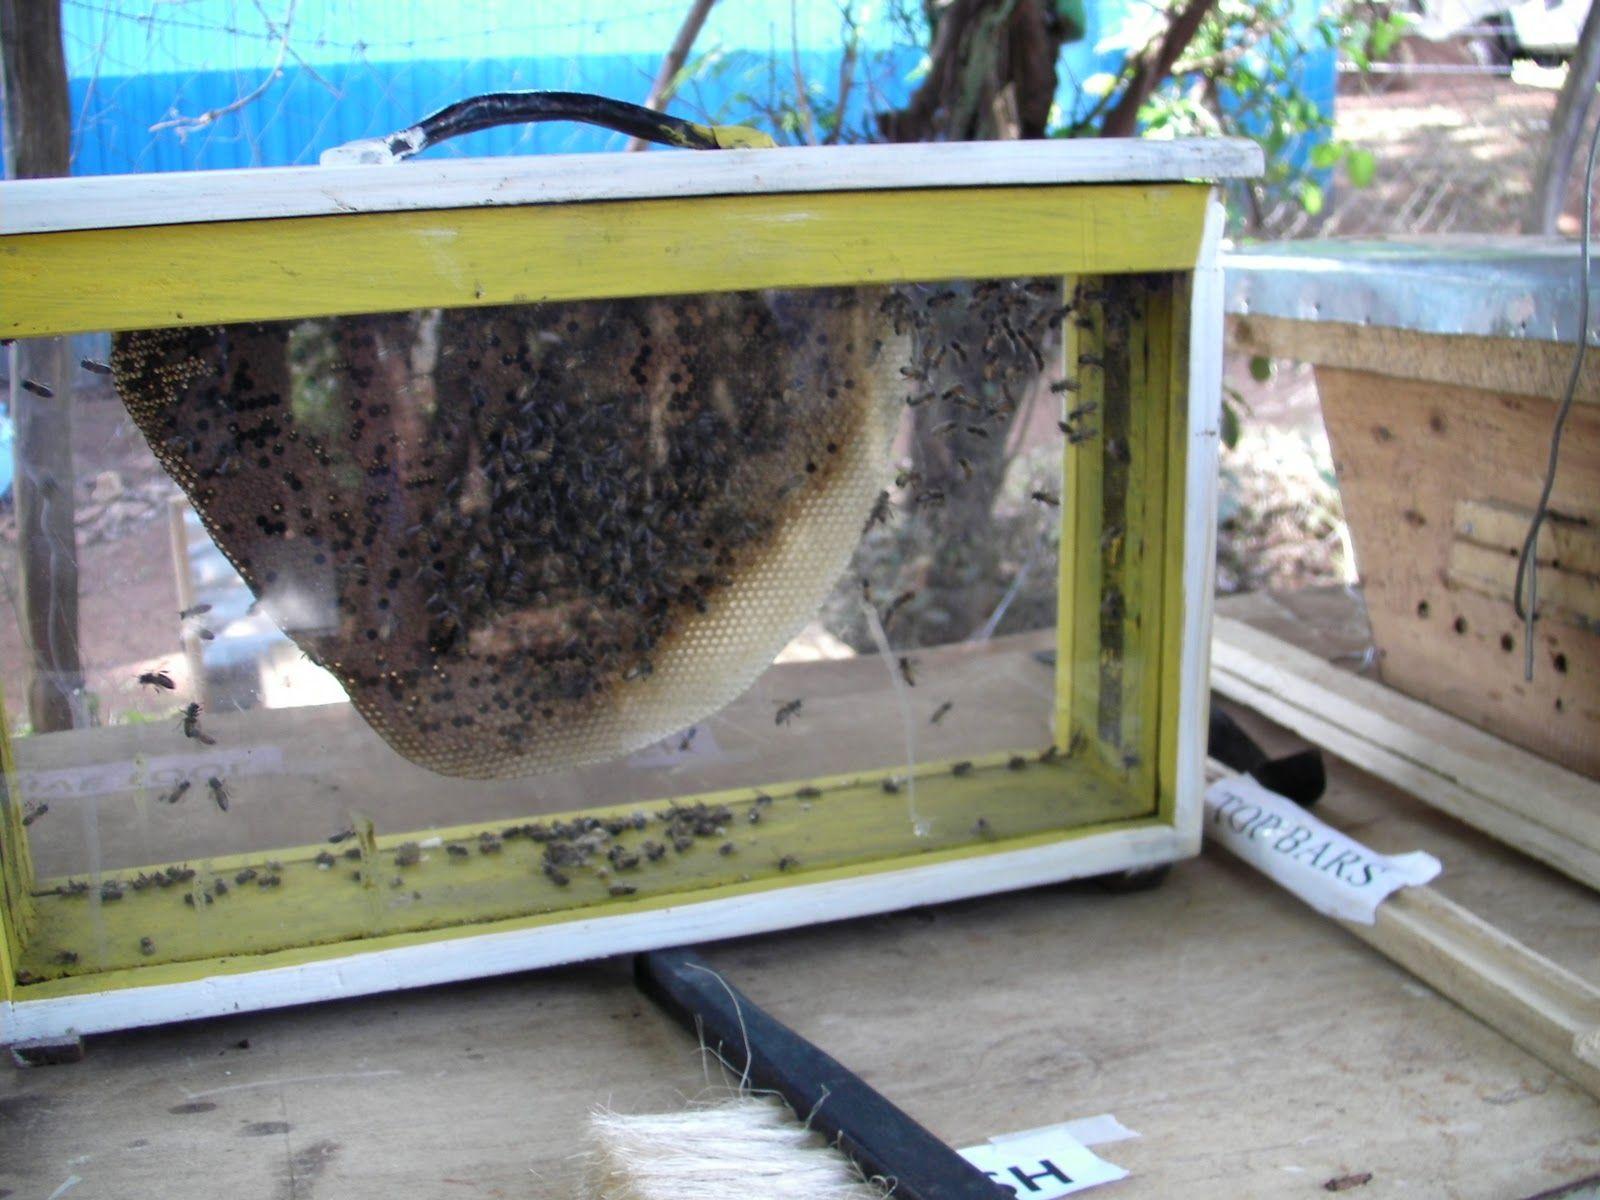 Marco moderno para colmena de abejas - Buscar con Google | granja ...